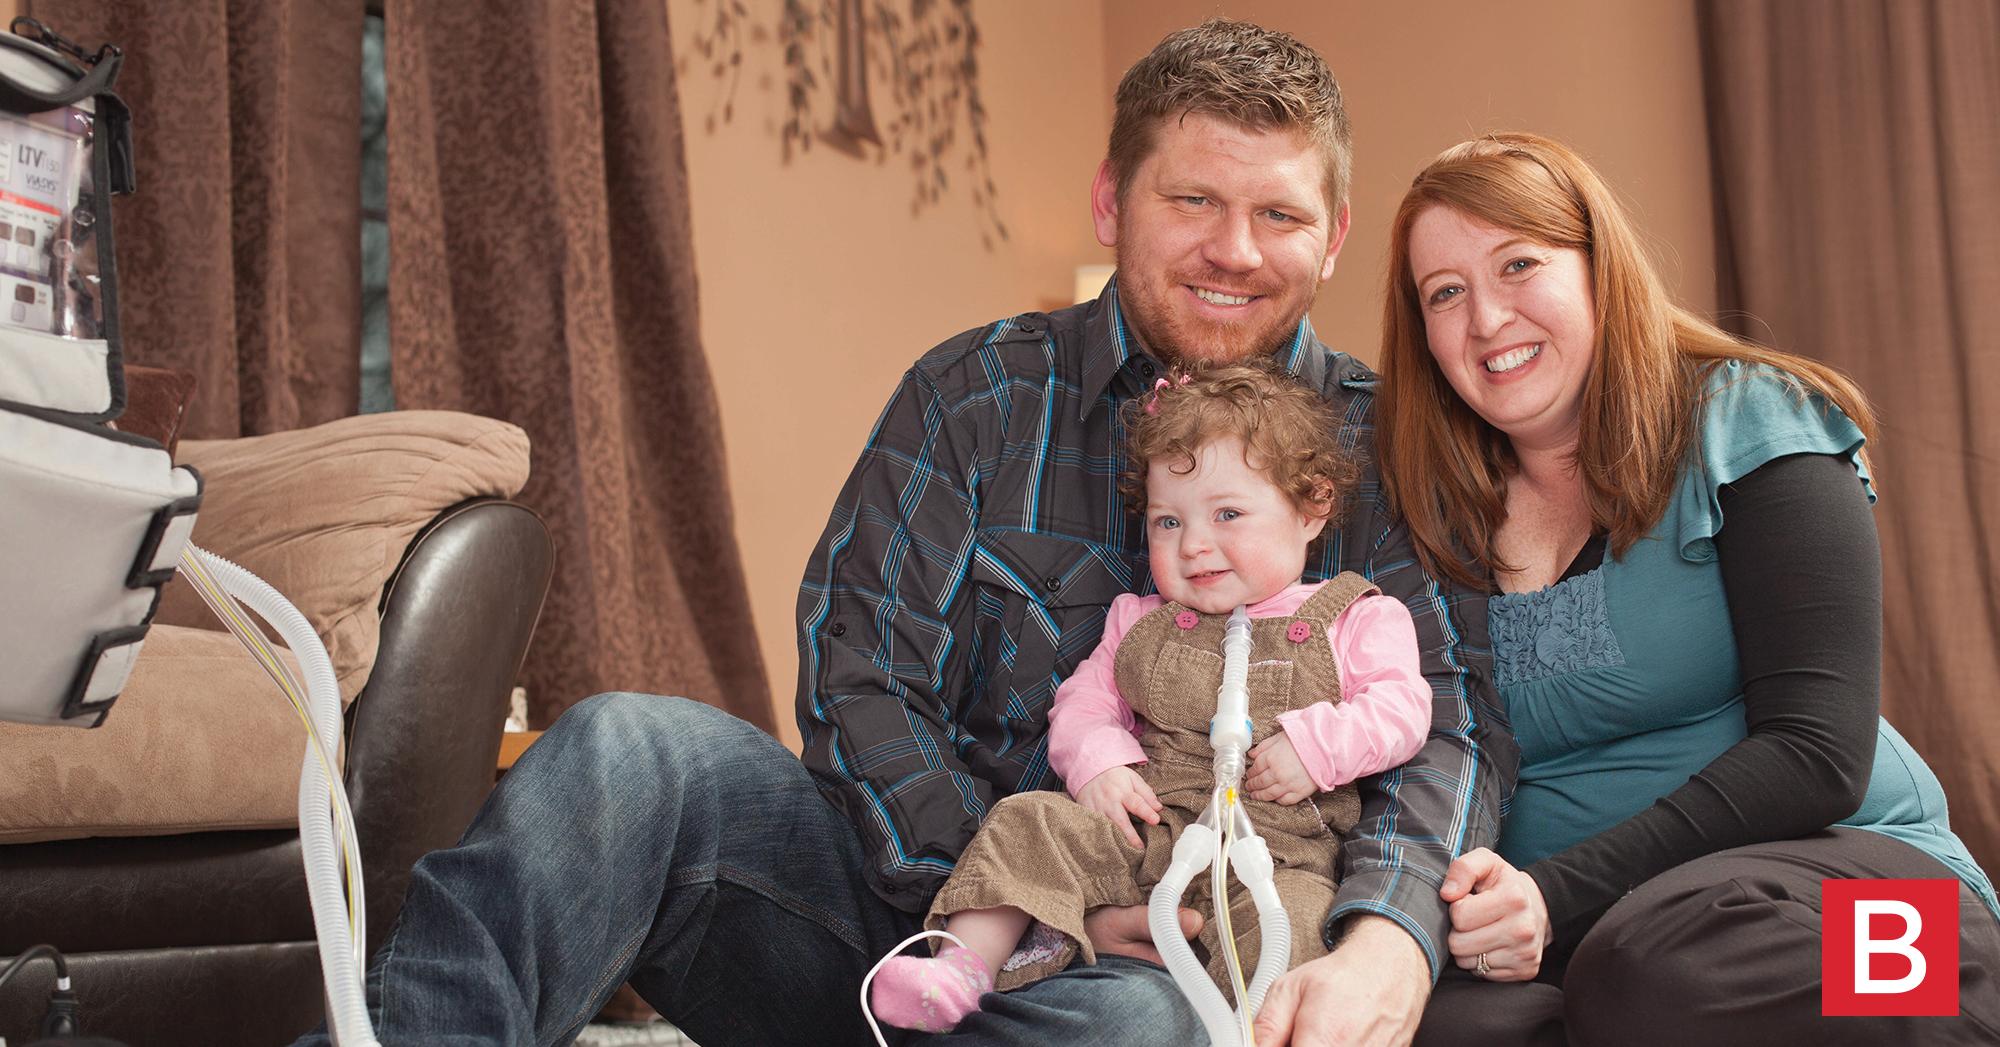 Pediatric Home Health Care Keeps Families Together